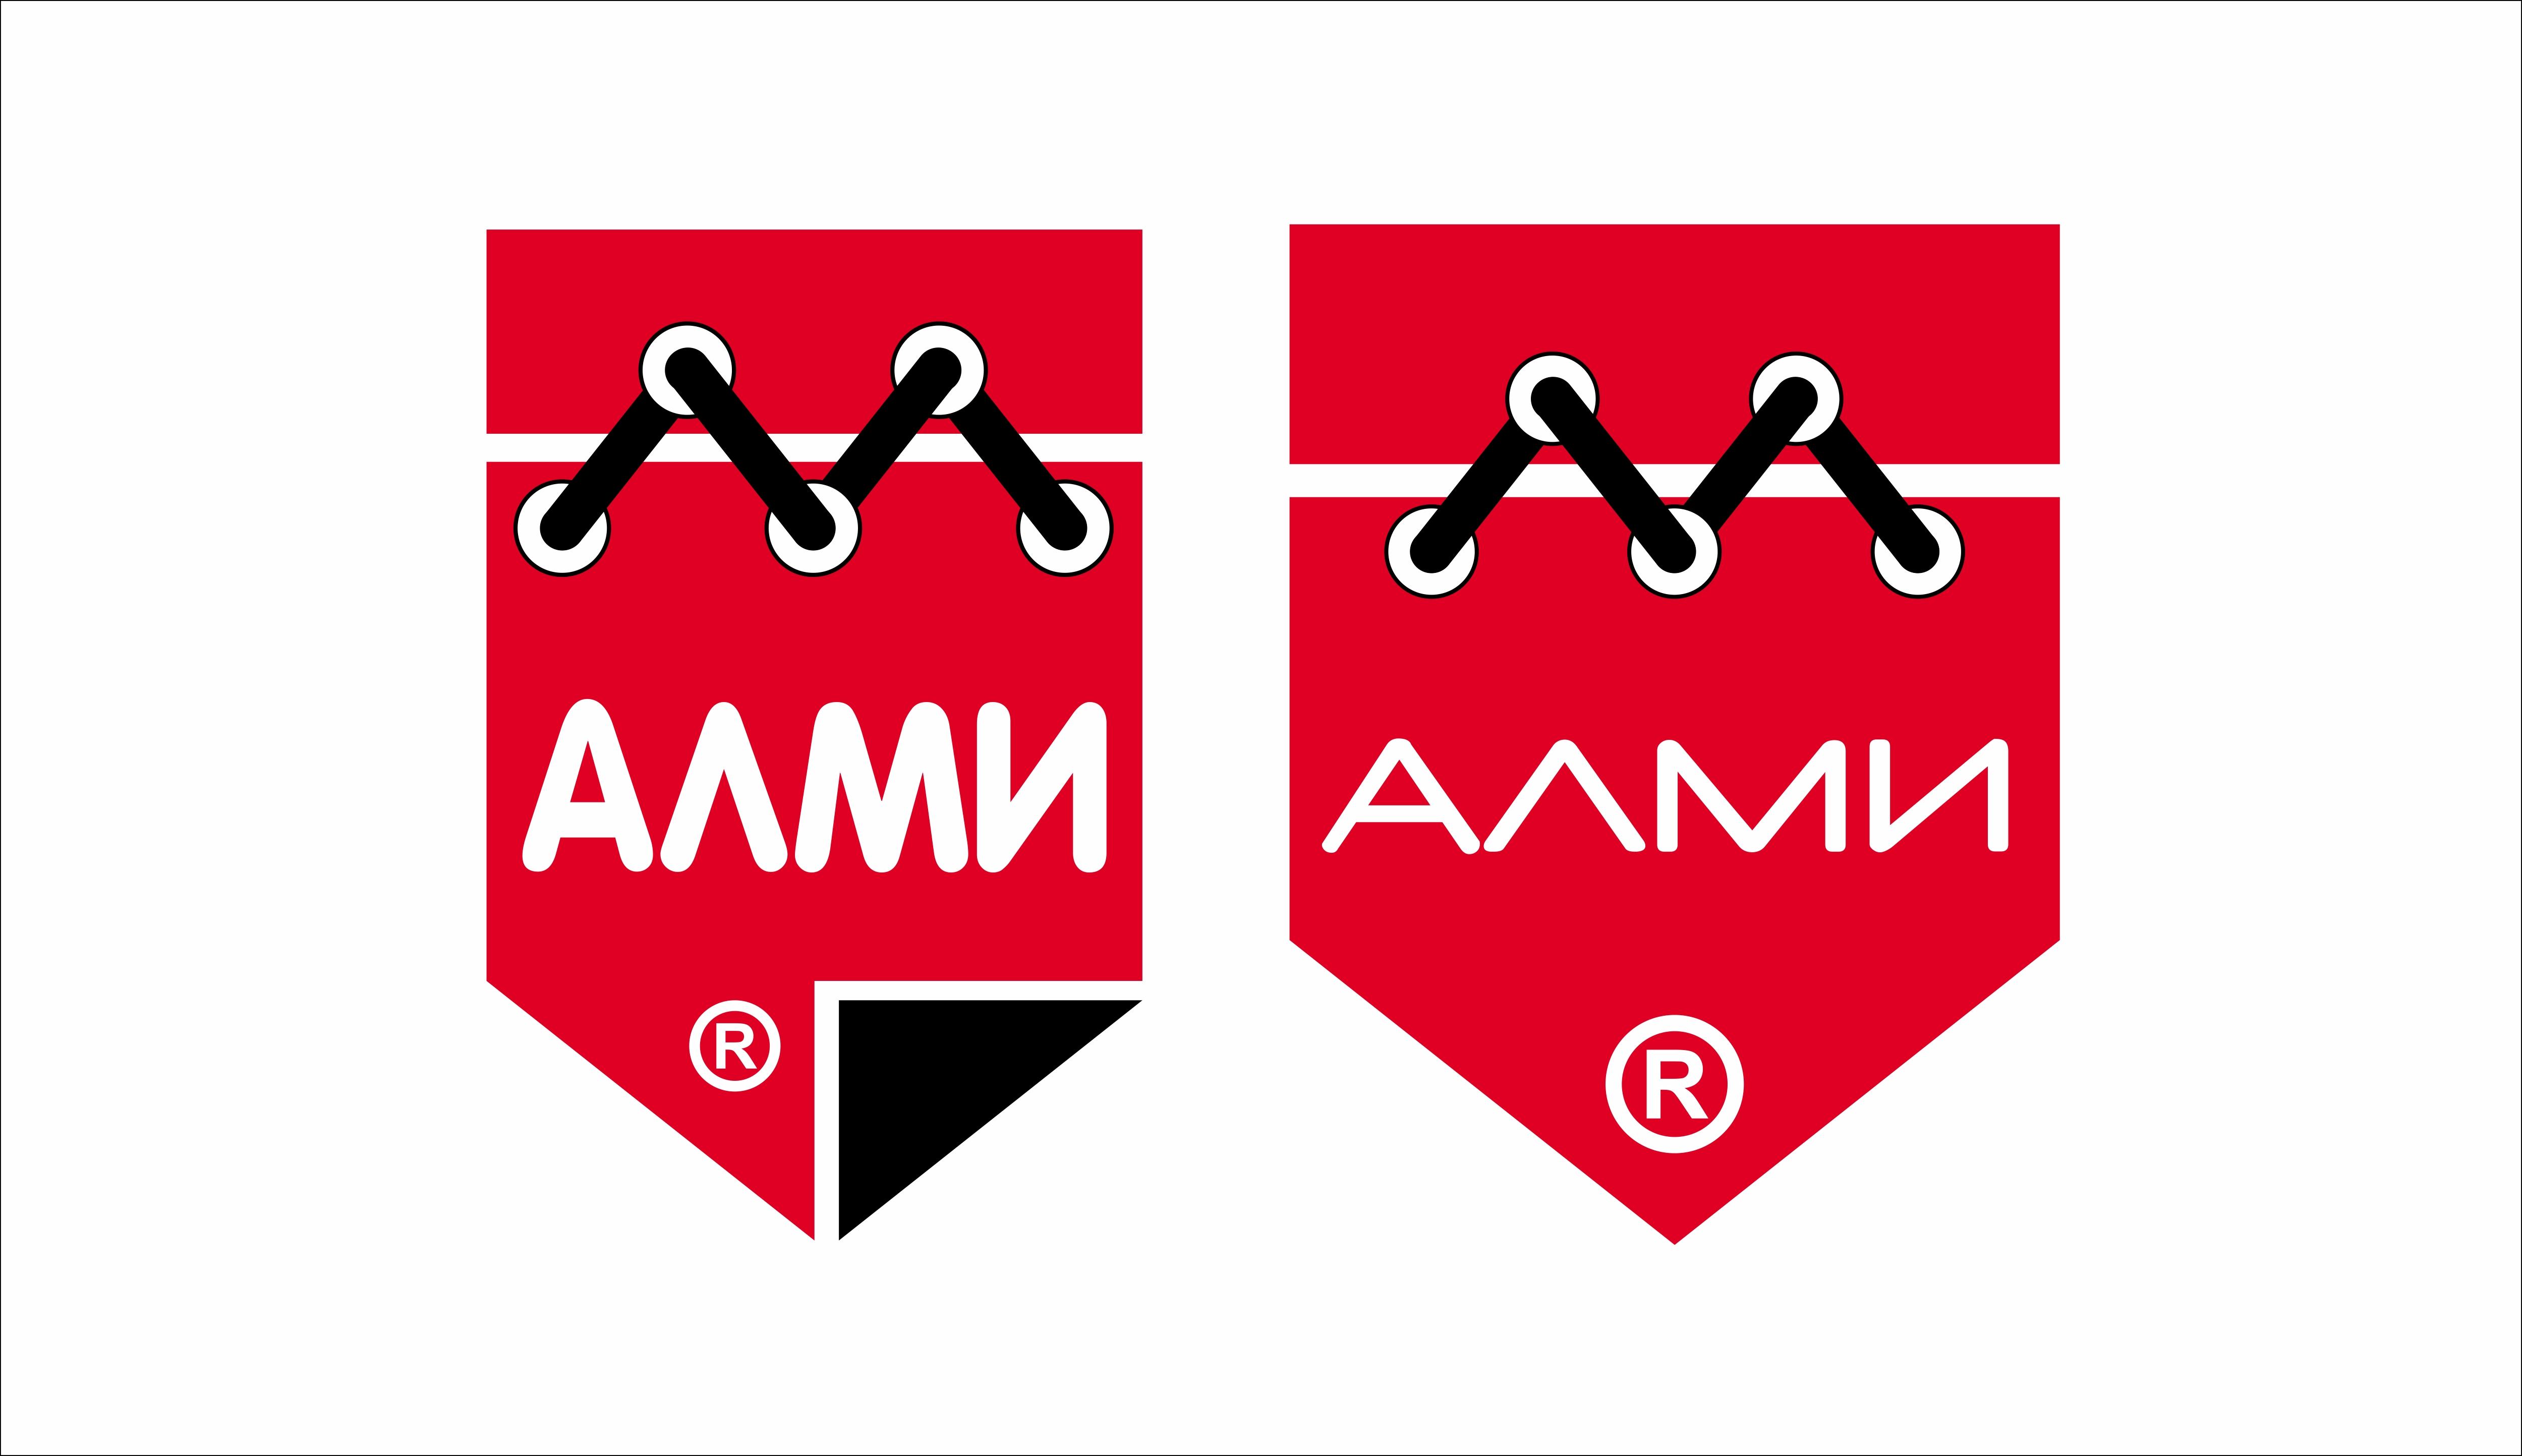 Дизайн логотипа обувной марки Алми фото f_90259ee0476c4b27.jpg